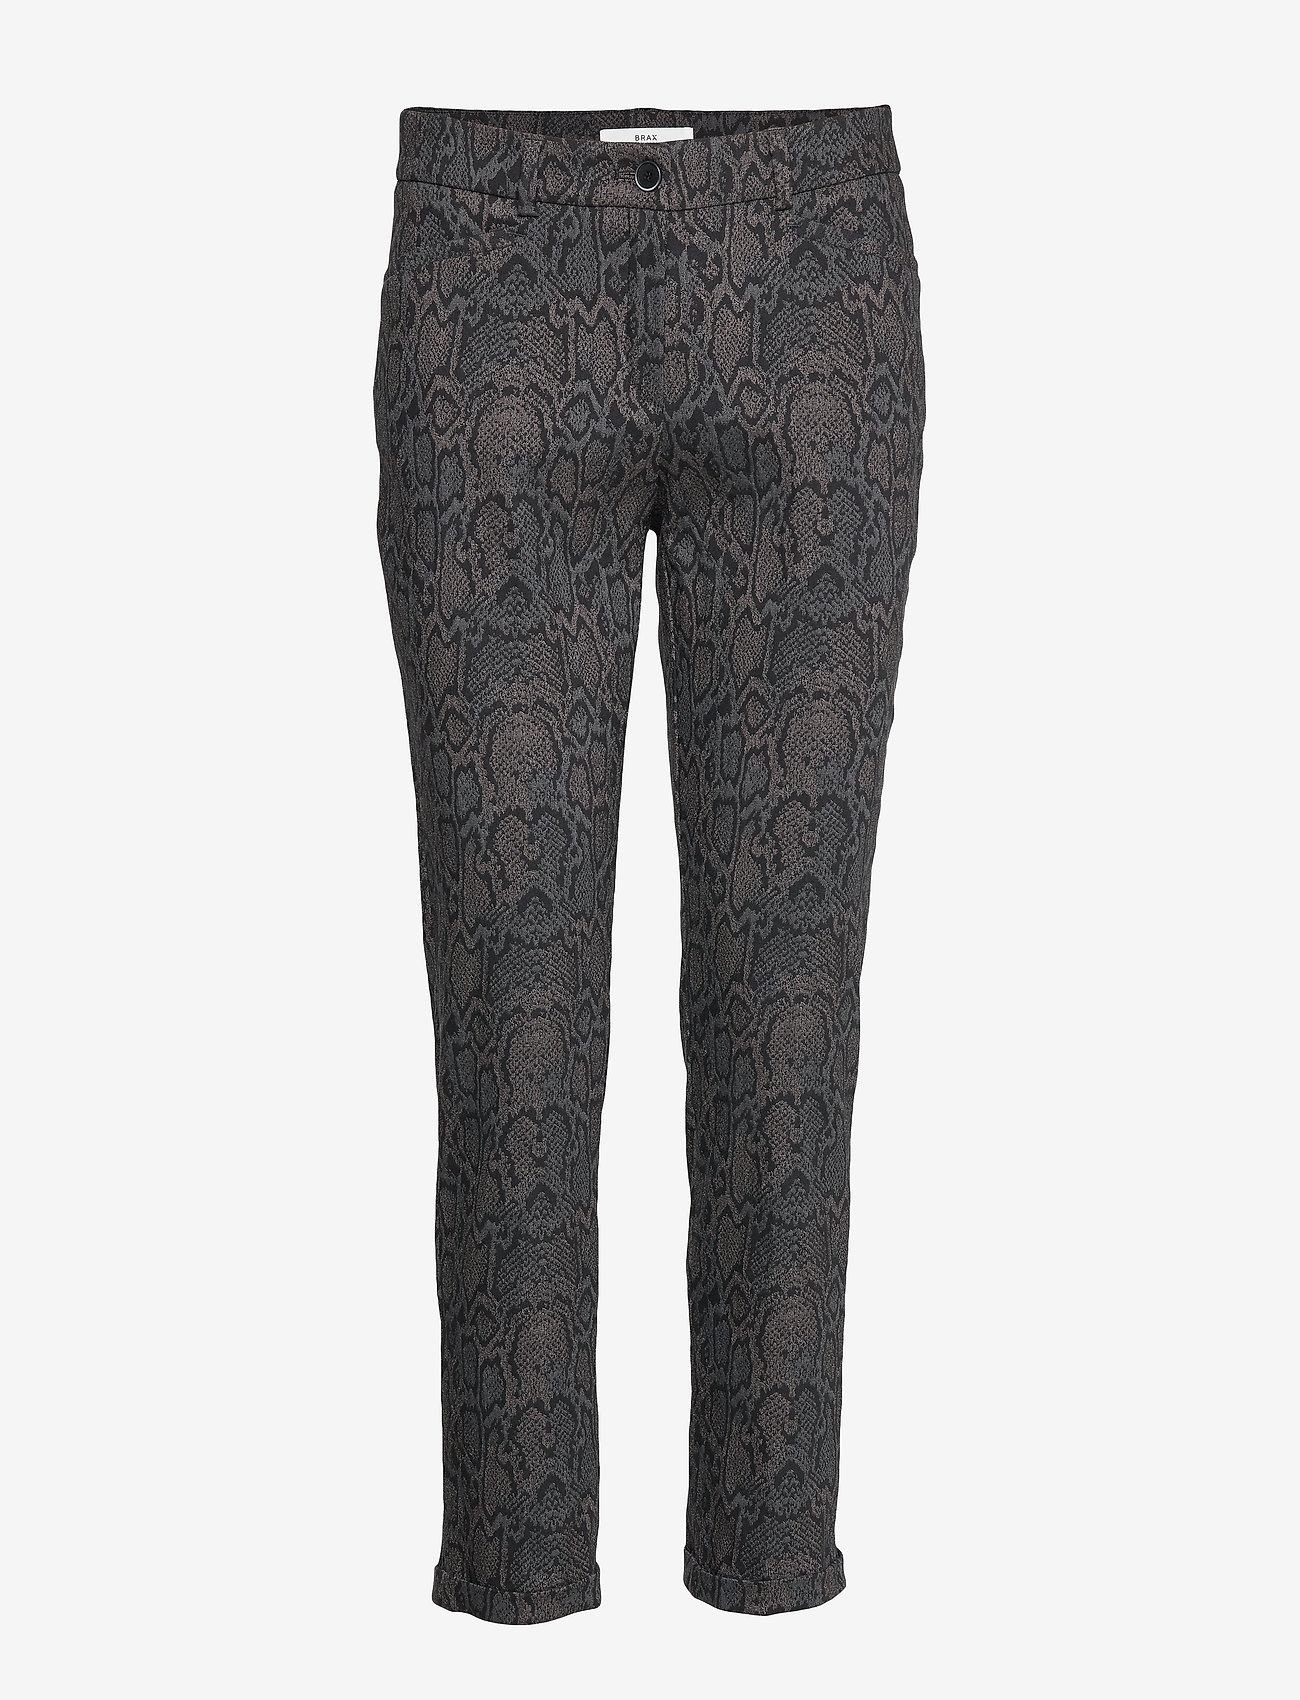 BRAX - MARON - slim fit trousers - brown - 0